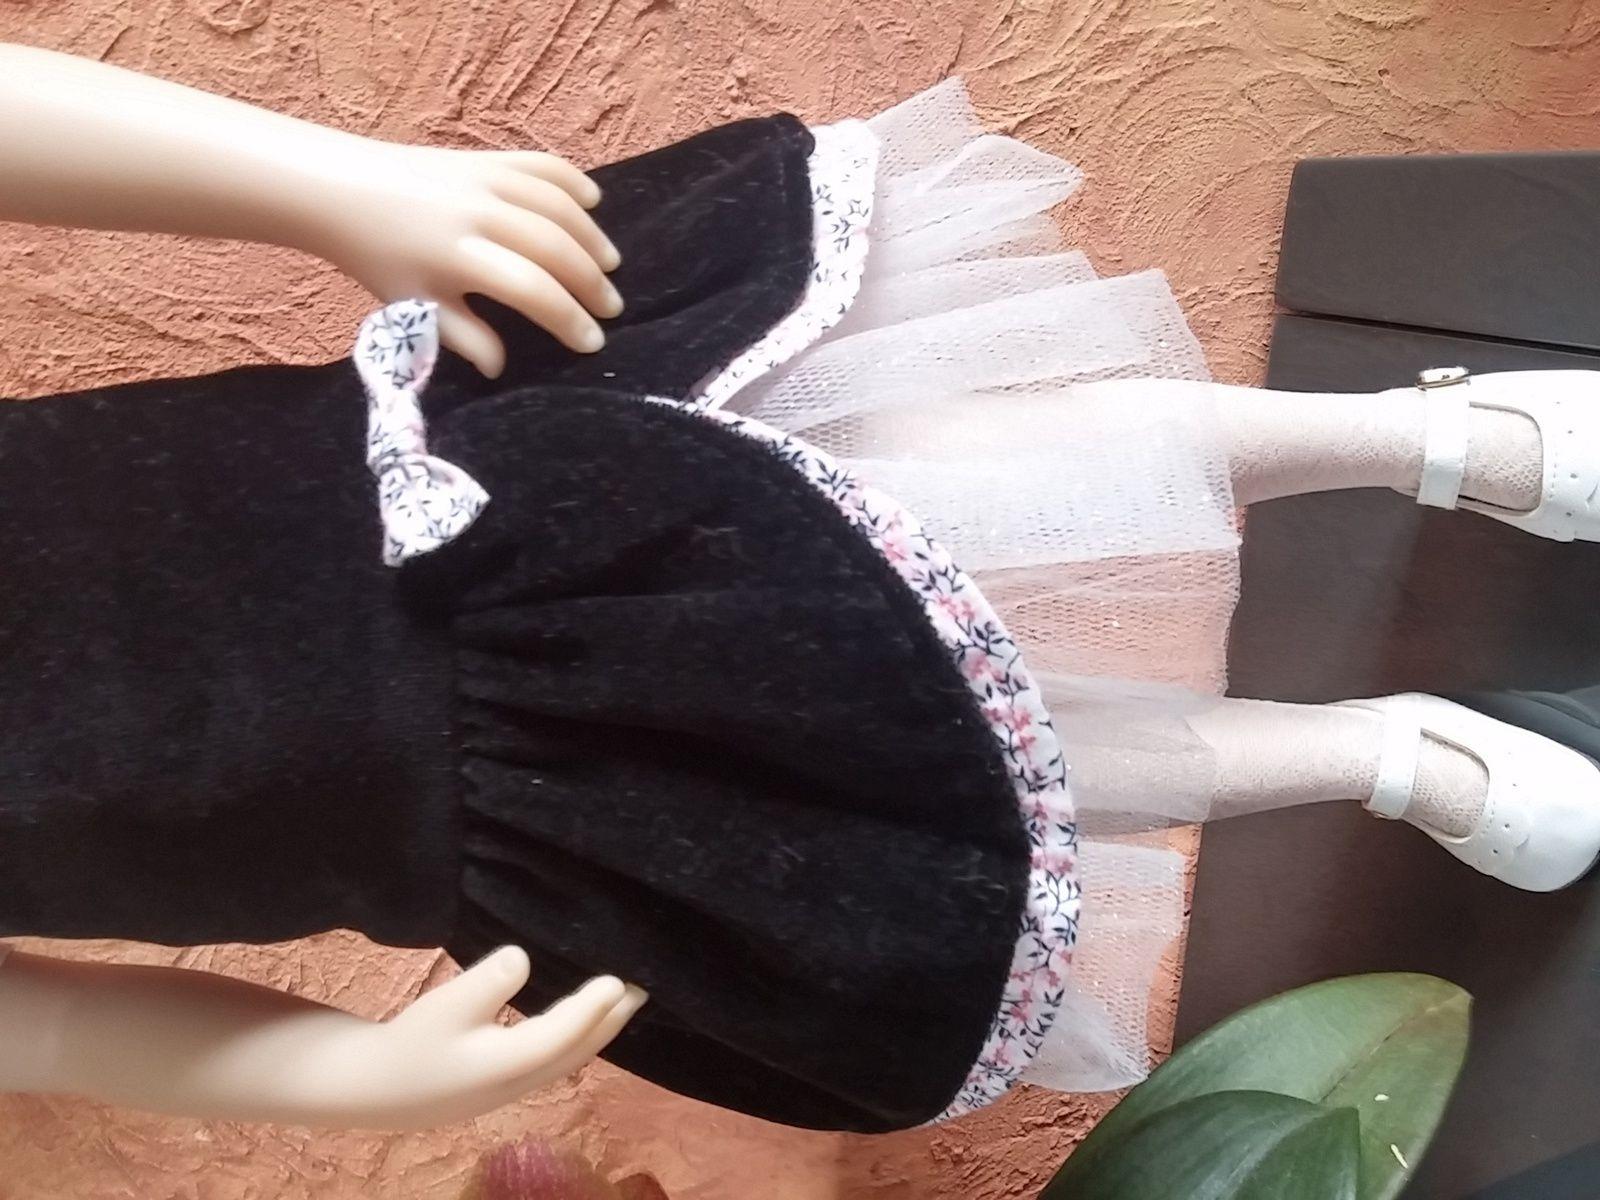 La jolie robe de Patricia